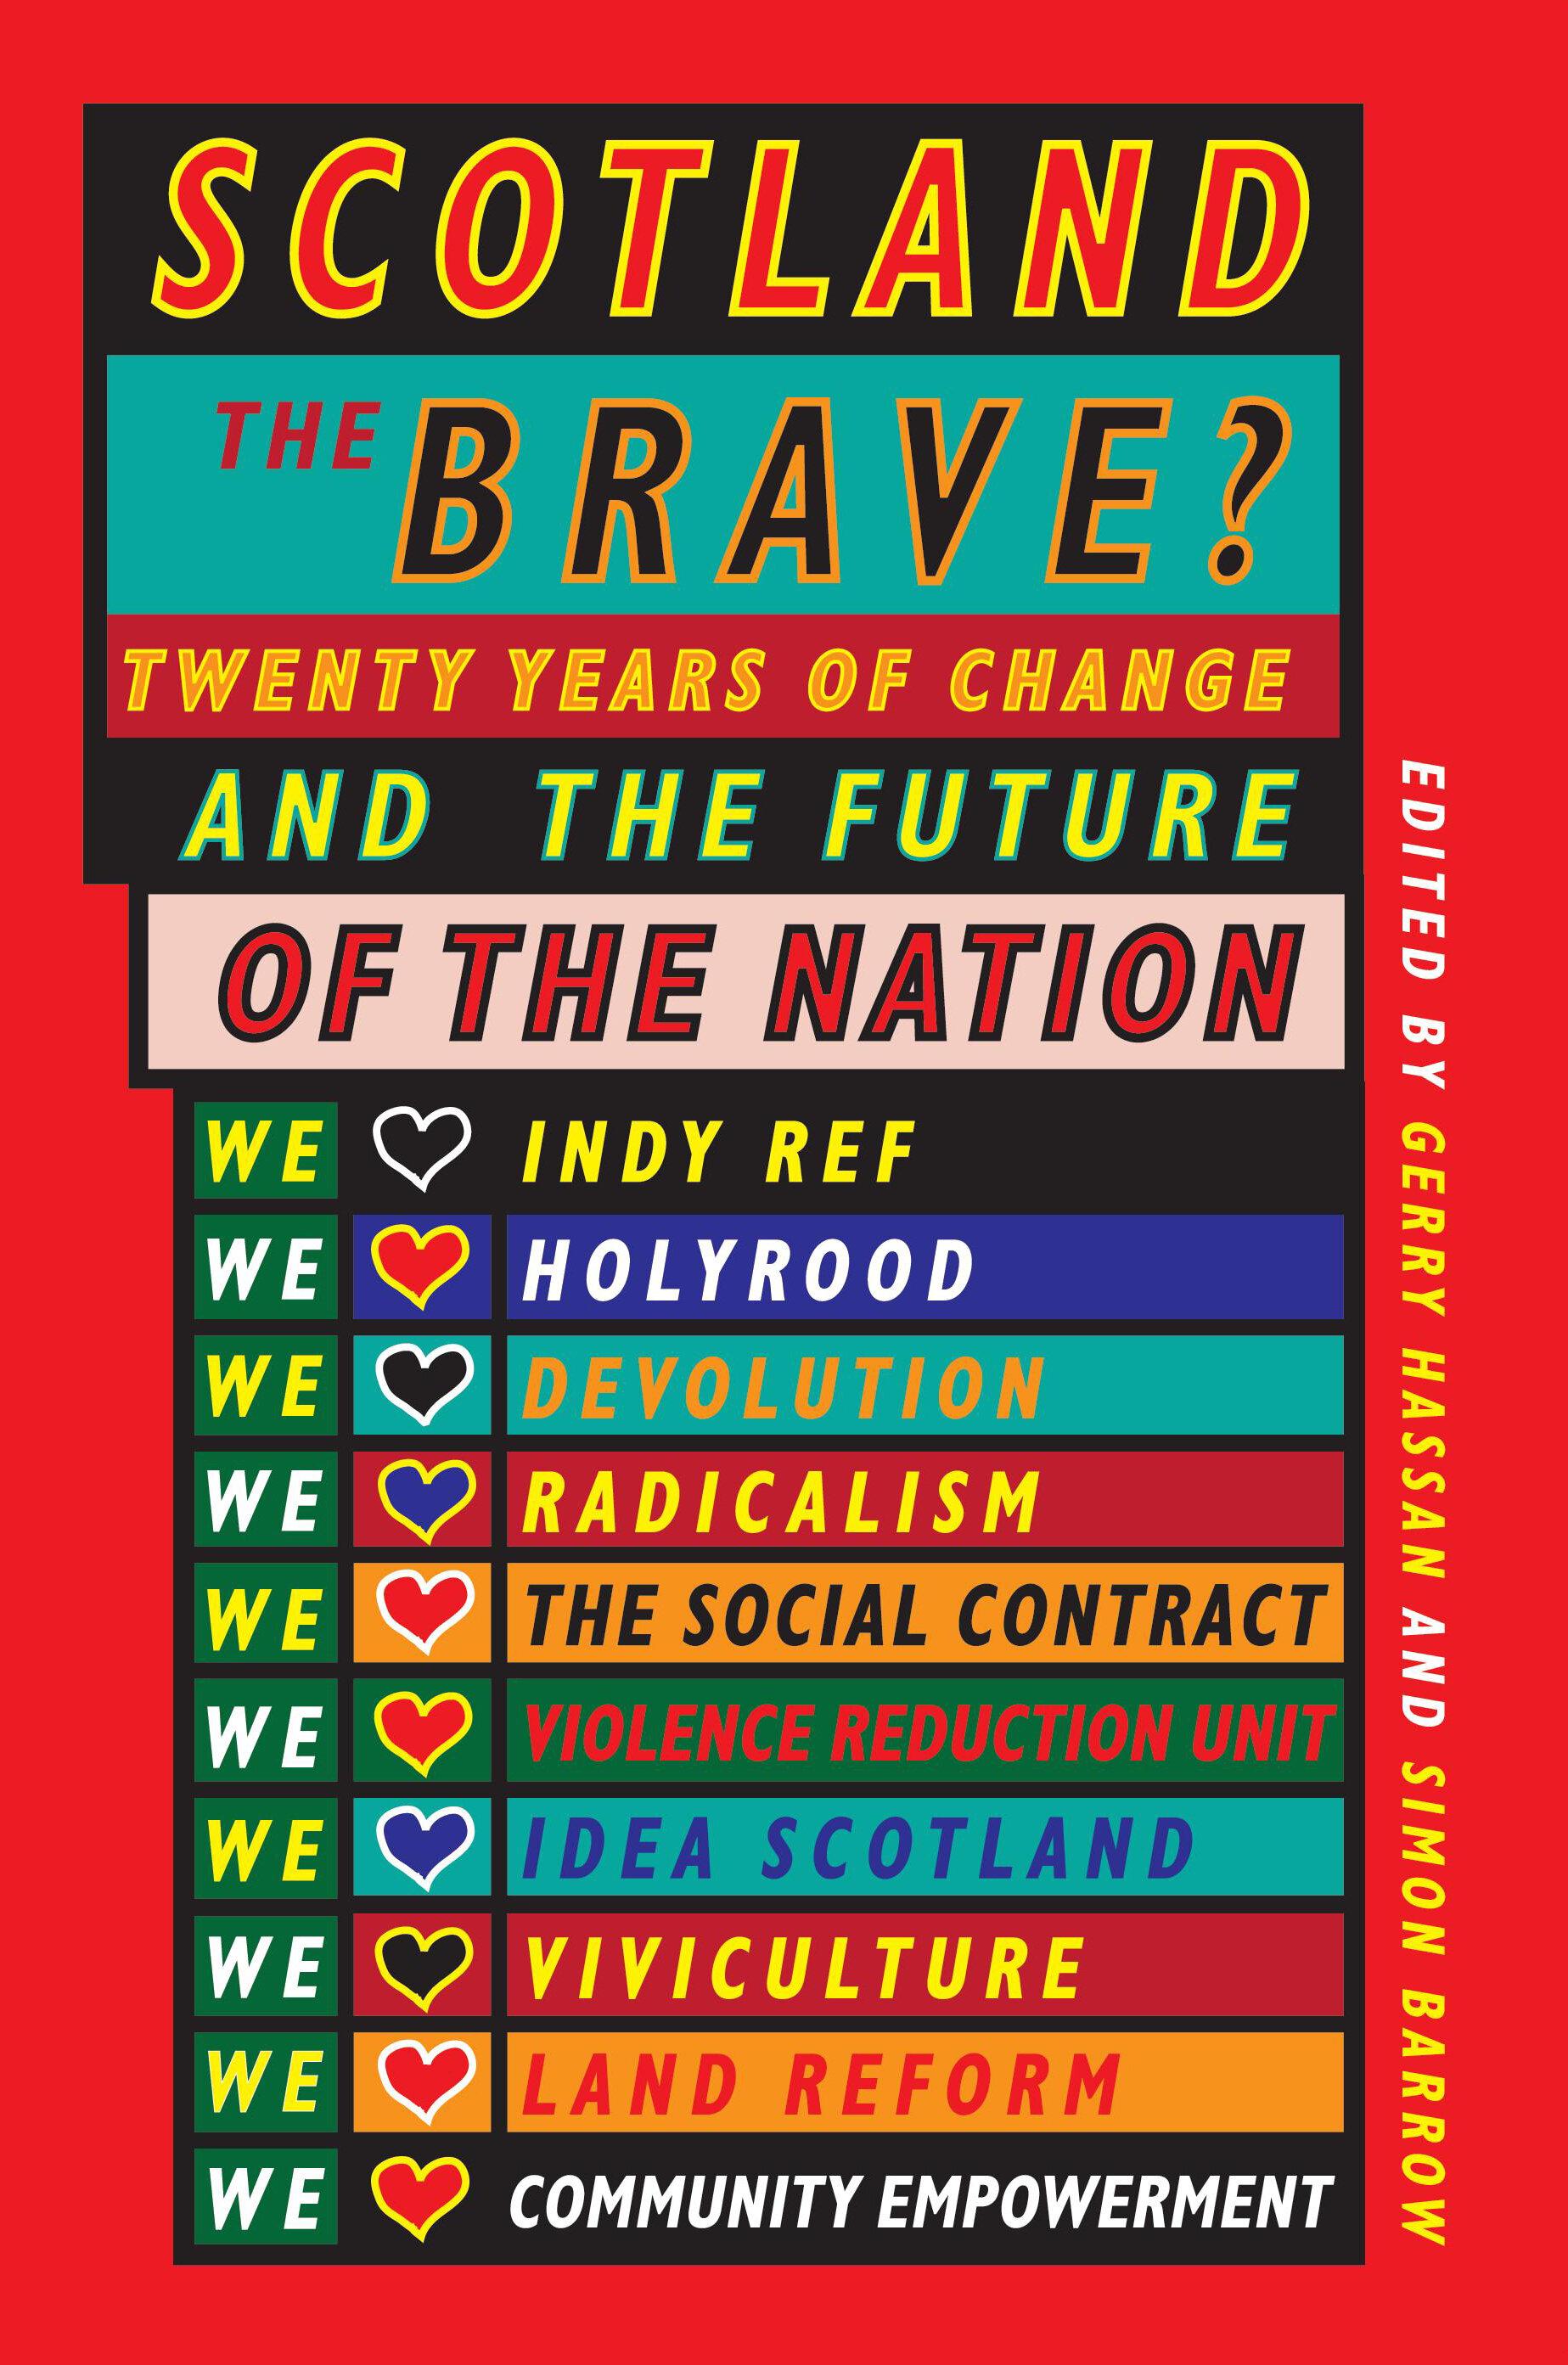 Scotland the Brave Gerry Hassan and Simon Barrow 9781913025021 Luath Press.jpg